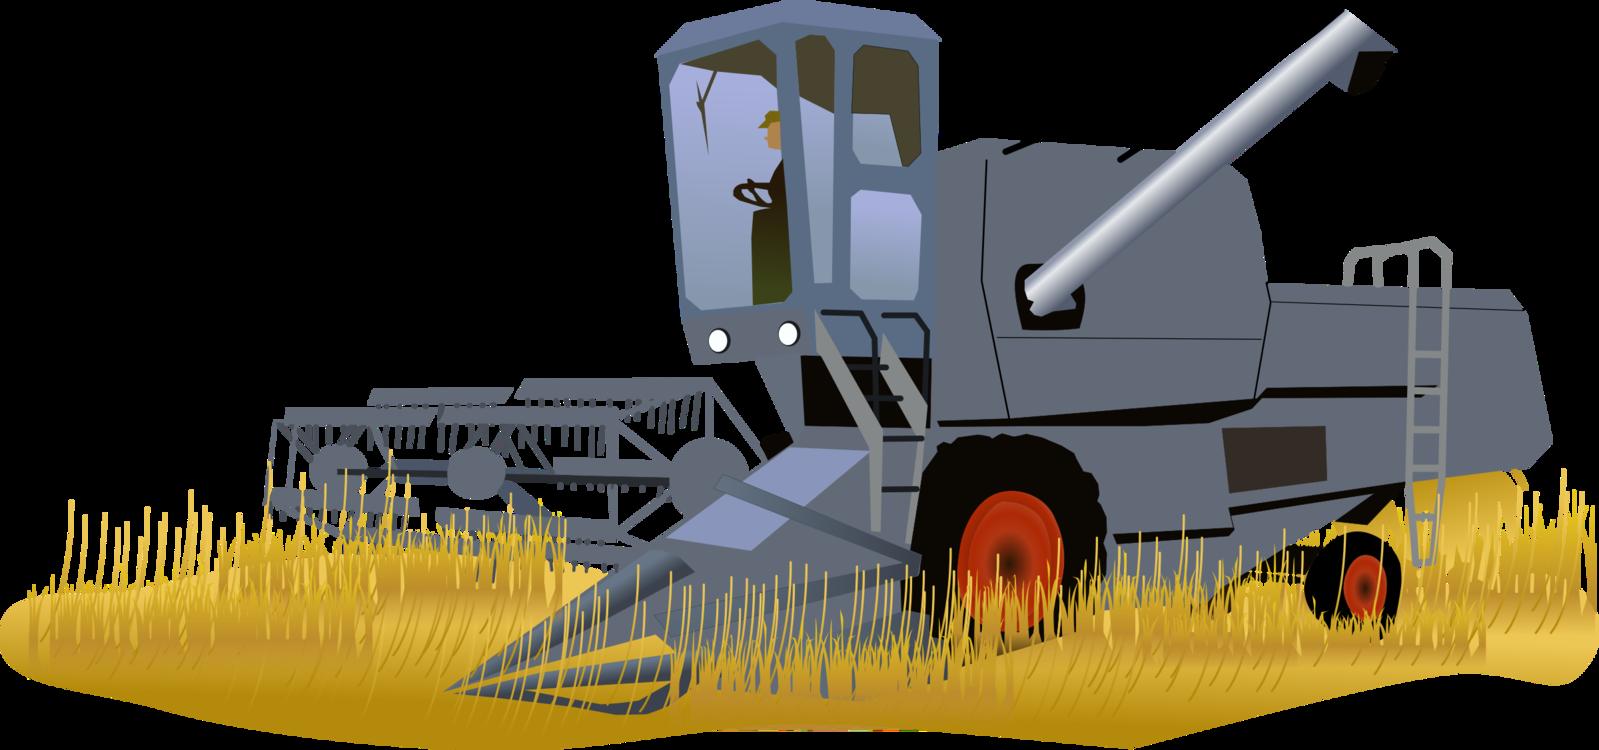 Bulldozer,Construction Equipment,Harvester